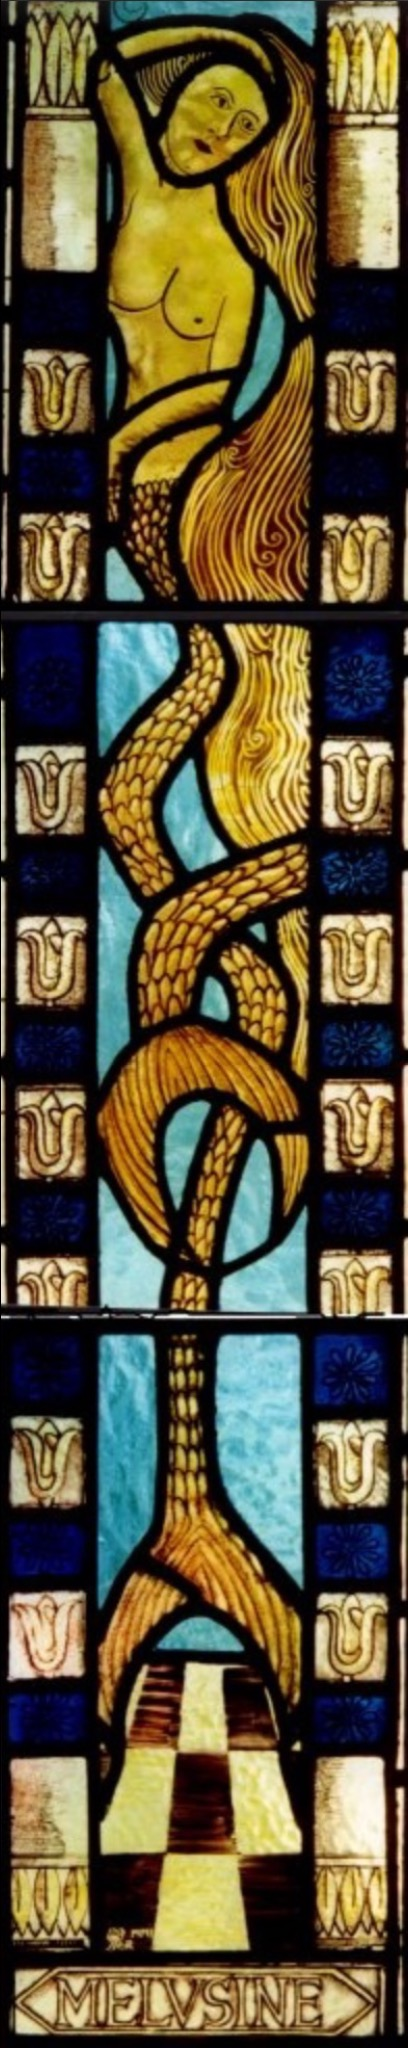 Melusine stained glass mermaid